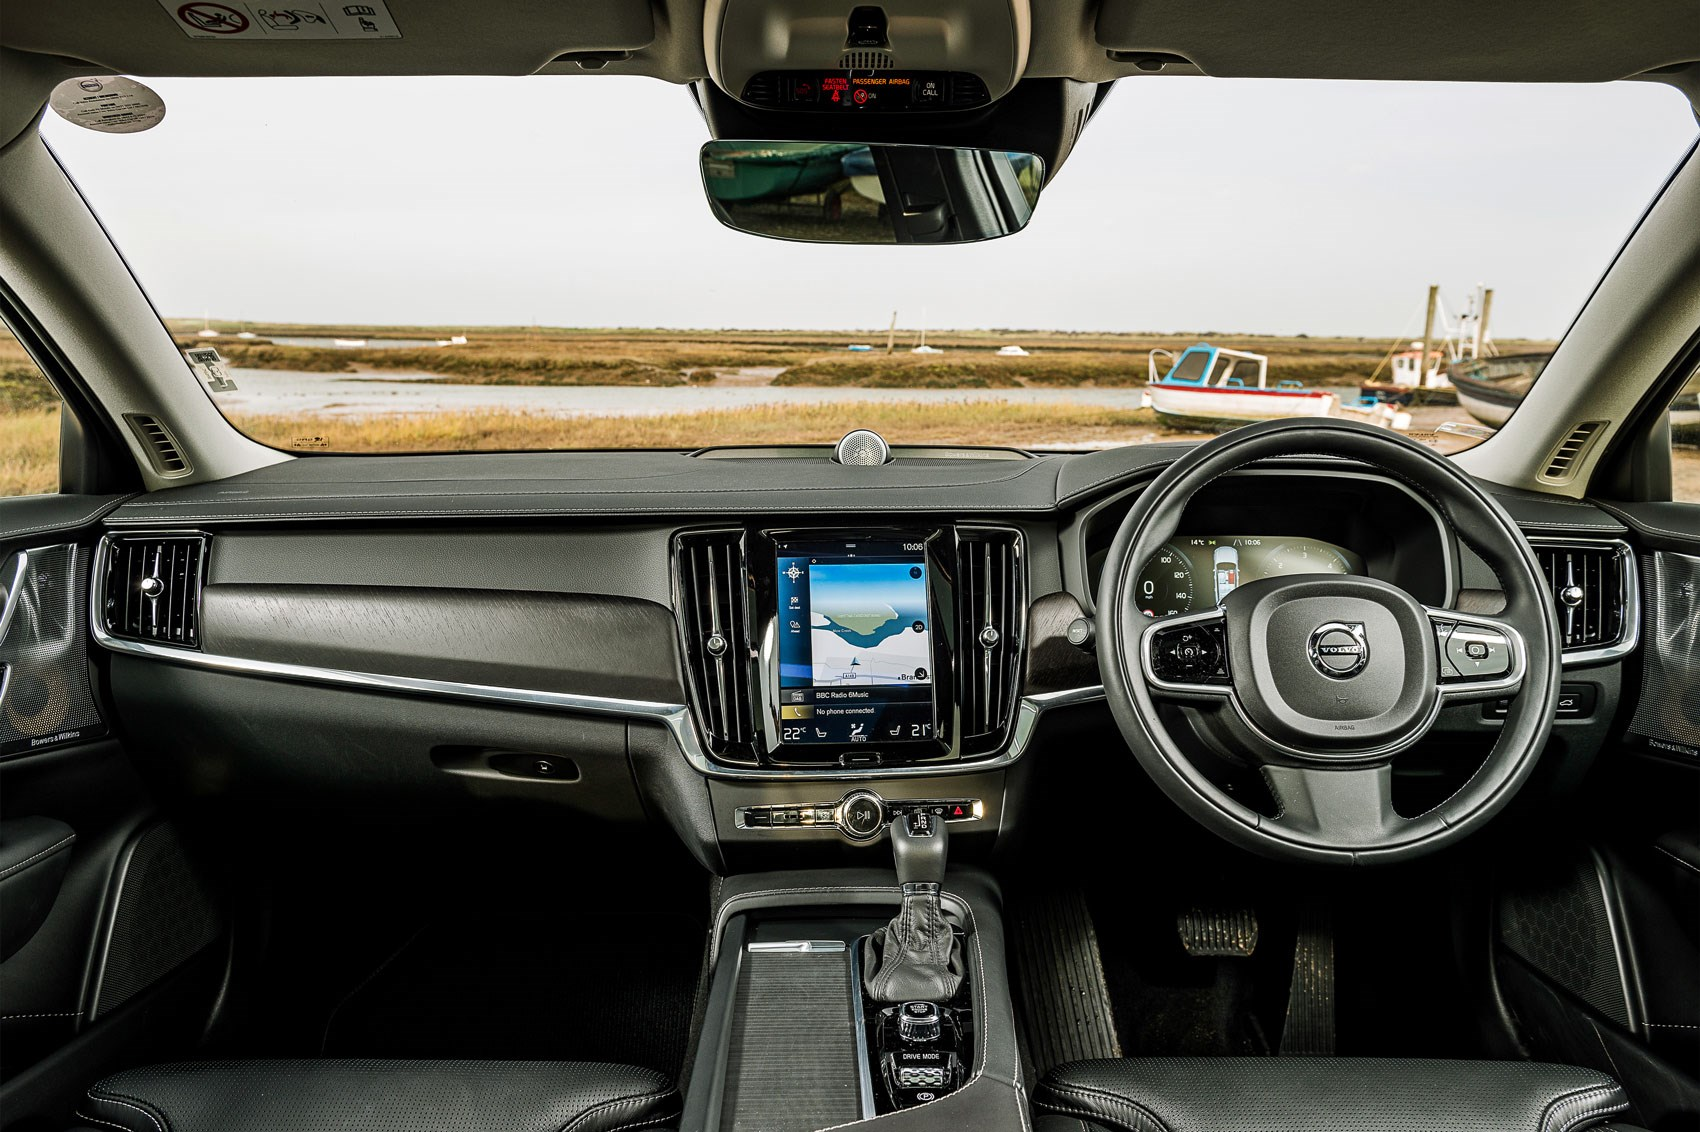 Subaru Wrx Sti 2016 Long Term Test Review Car Magazine Sport Bra Golden Nick Good Quality E350d All Terrain Vs A6 Allroad V90 Cross Country Group